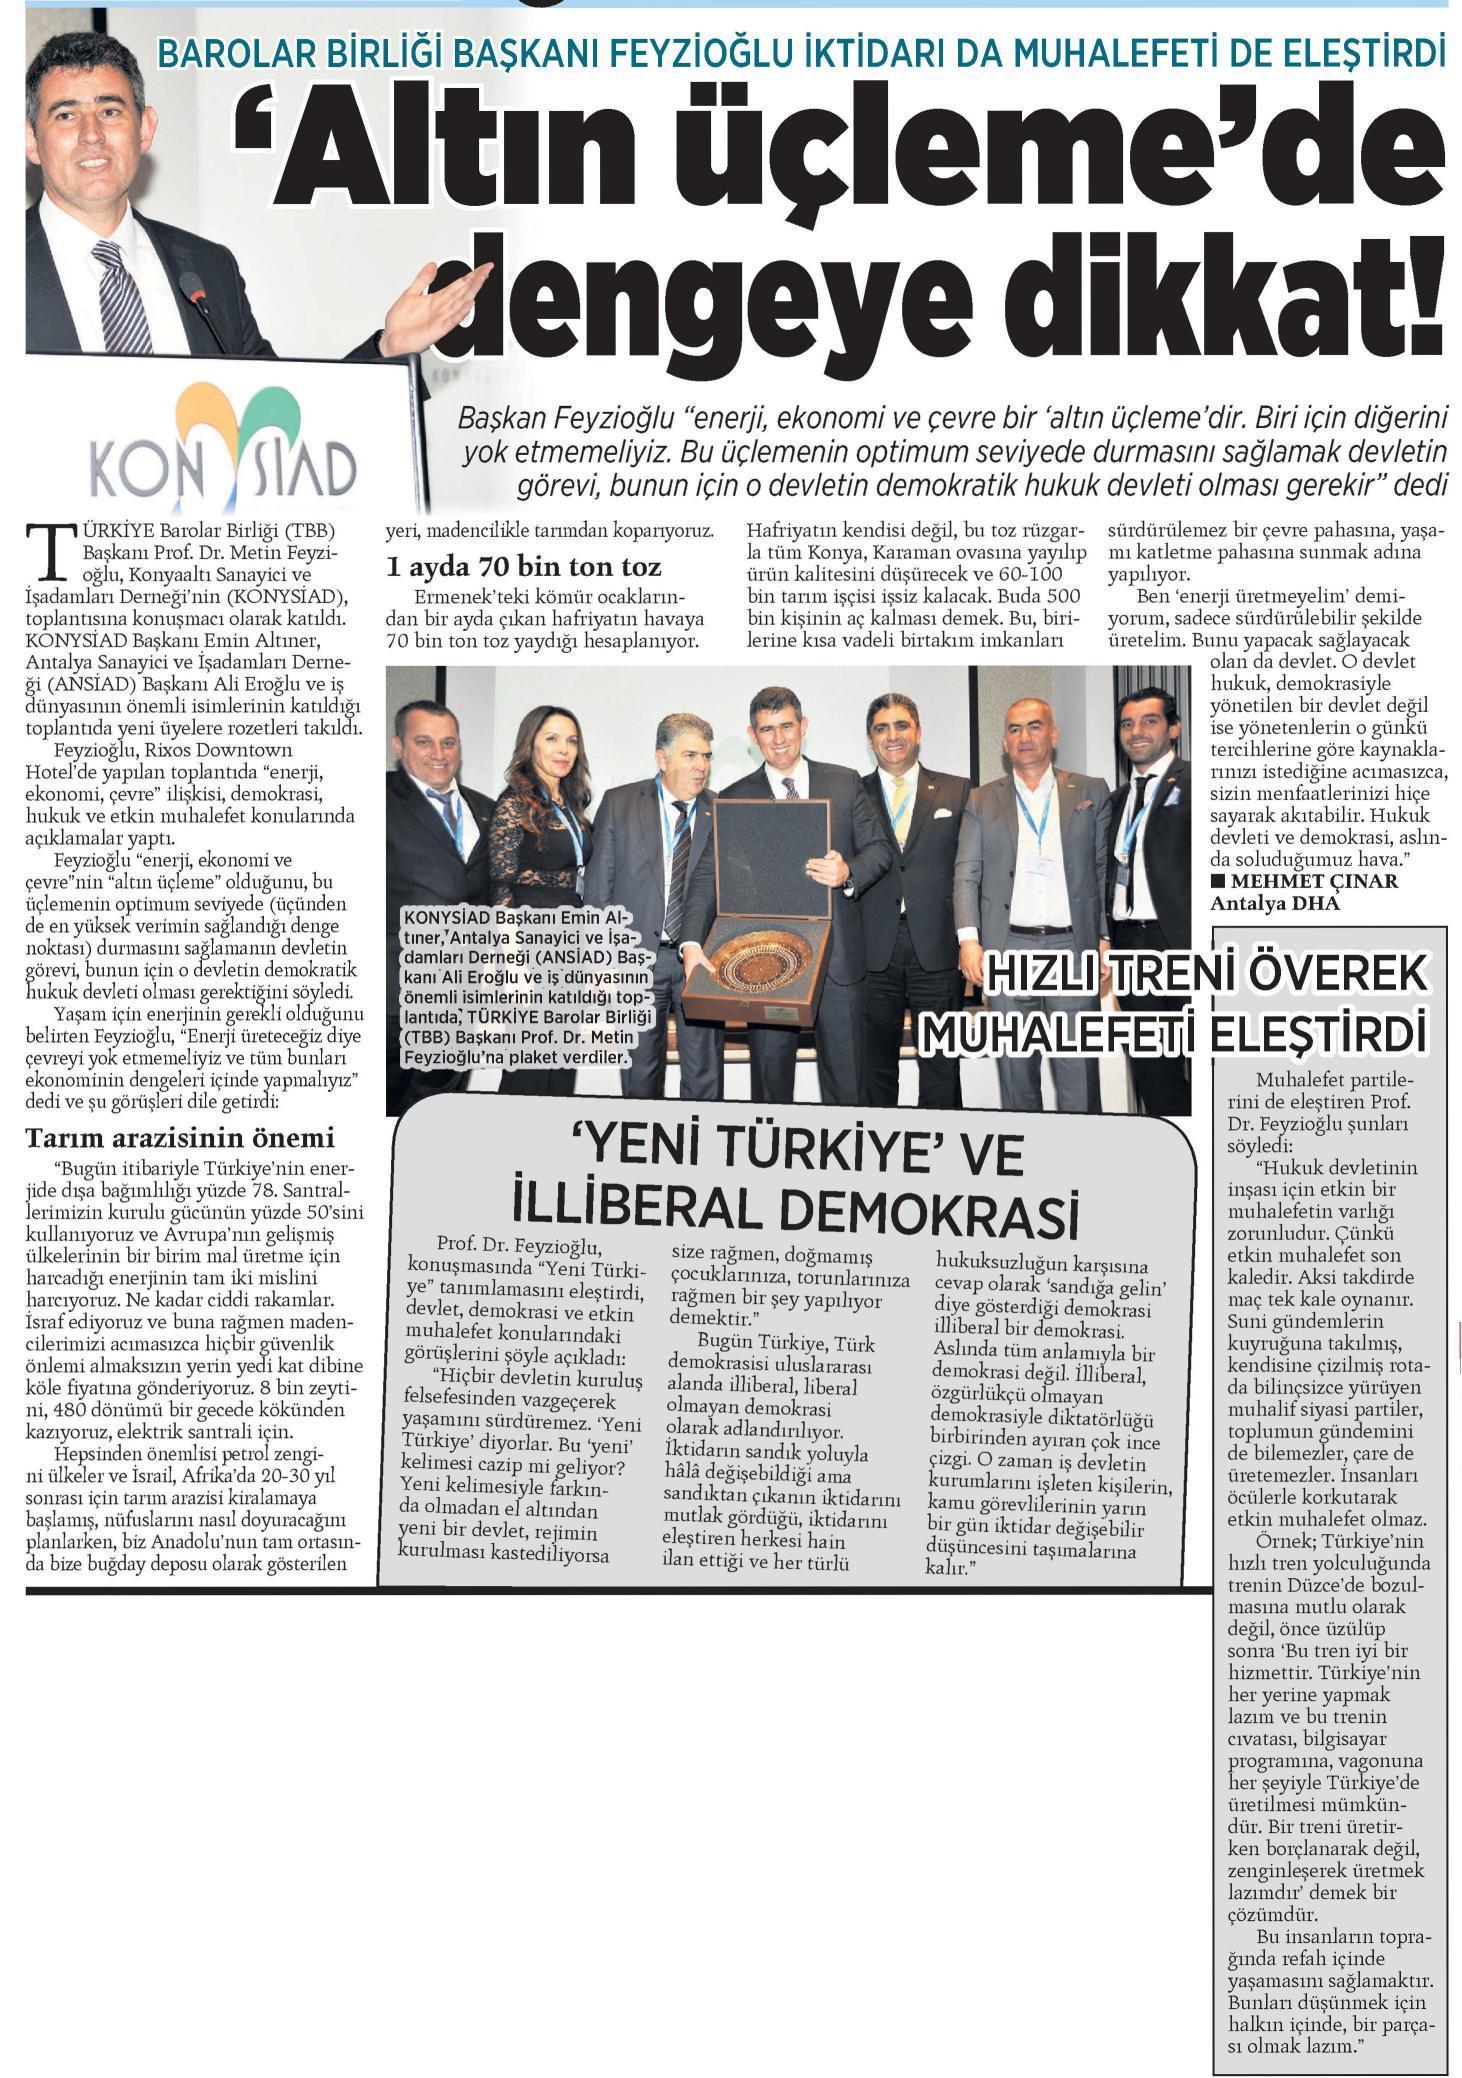 Milliyet Akdeniz, Alt�n ��leme'de dengeye dikkat